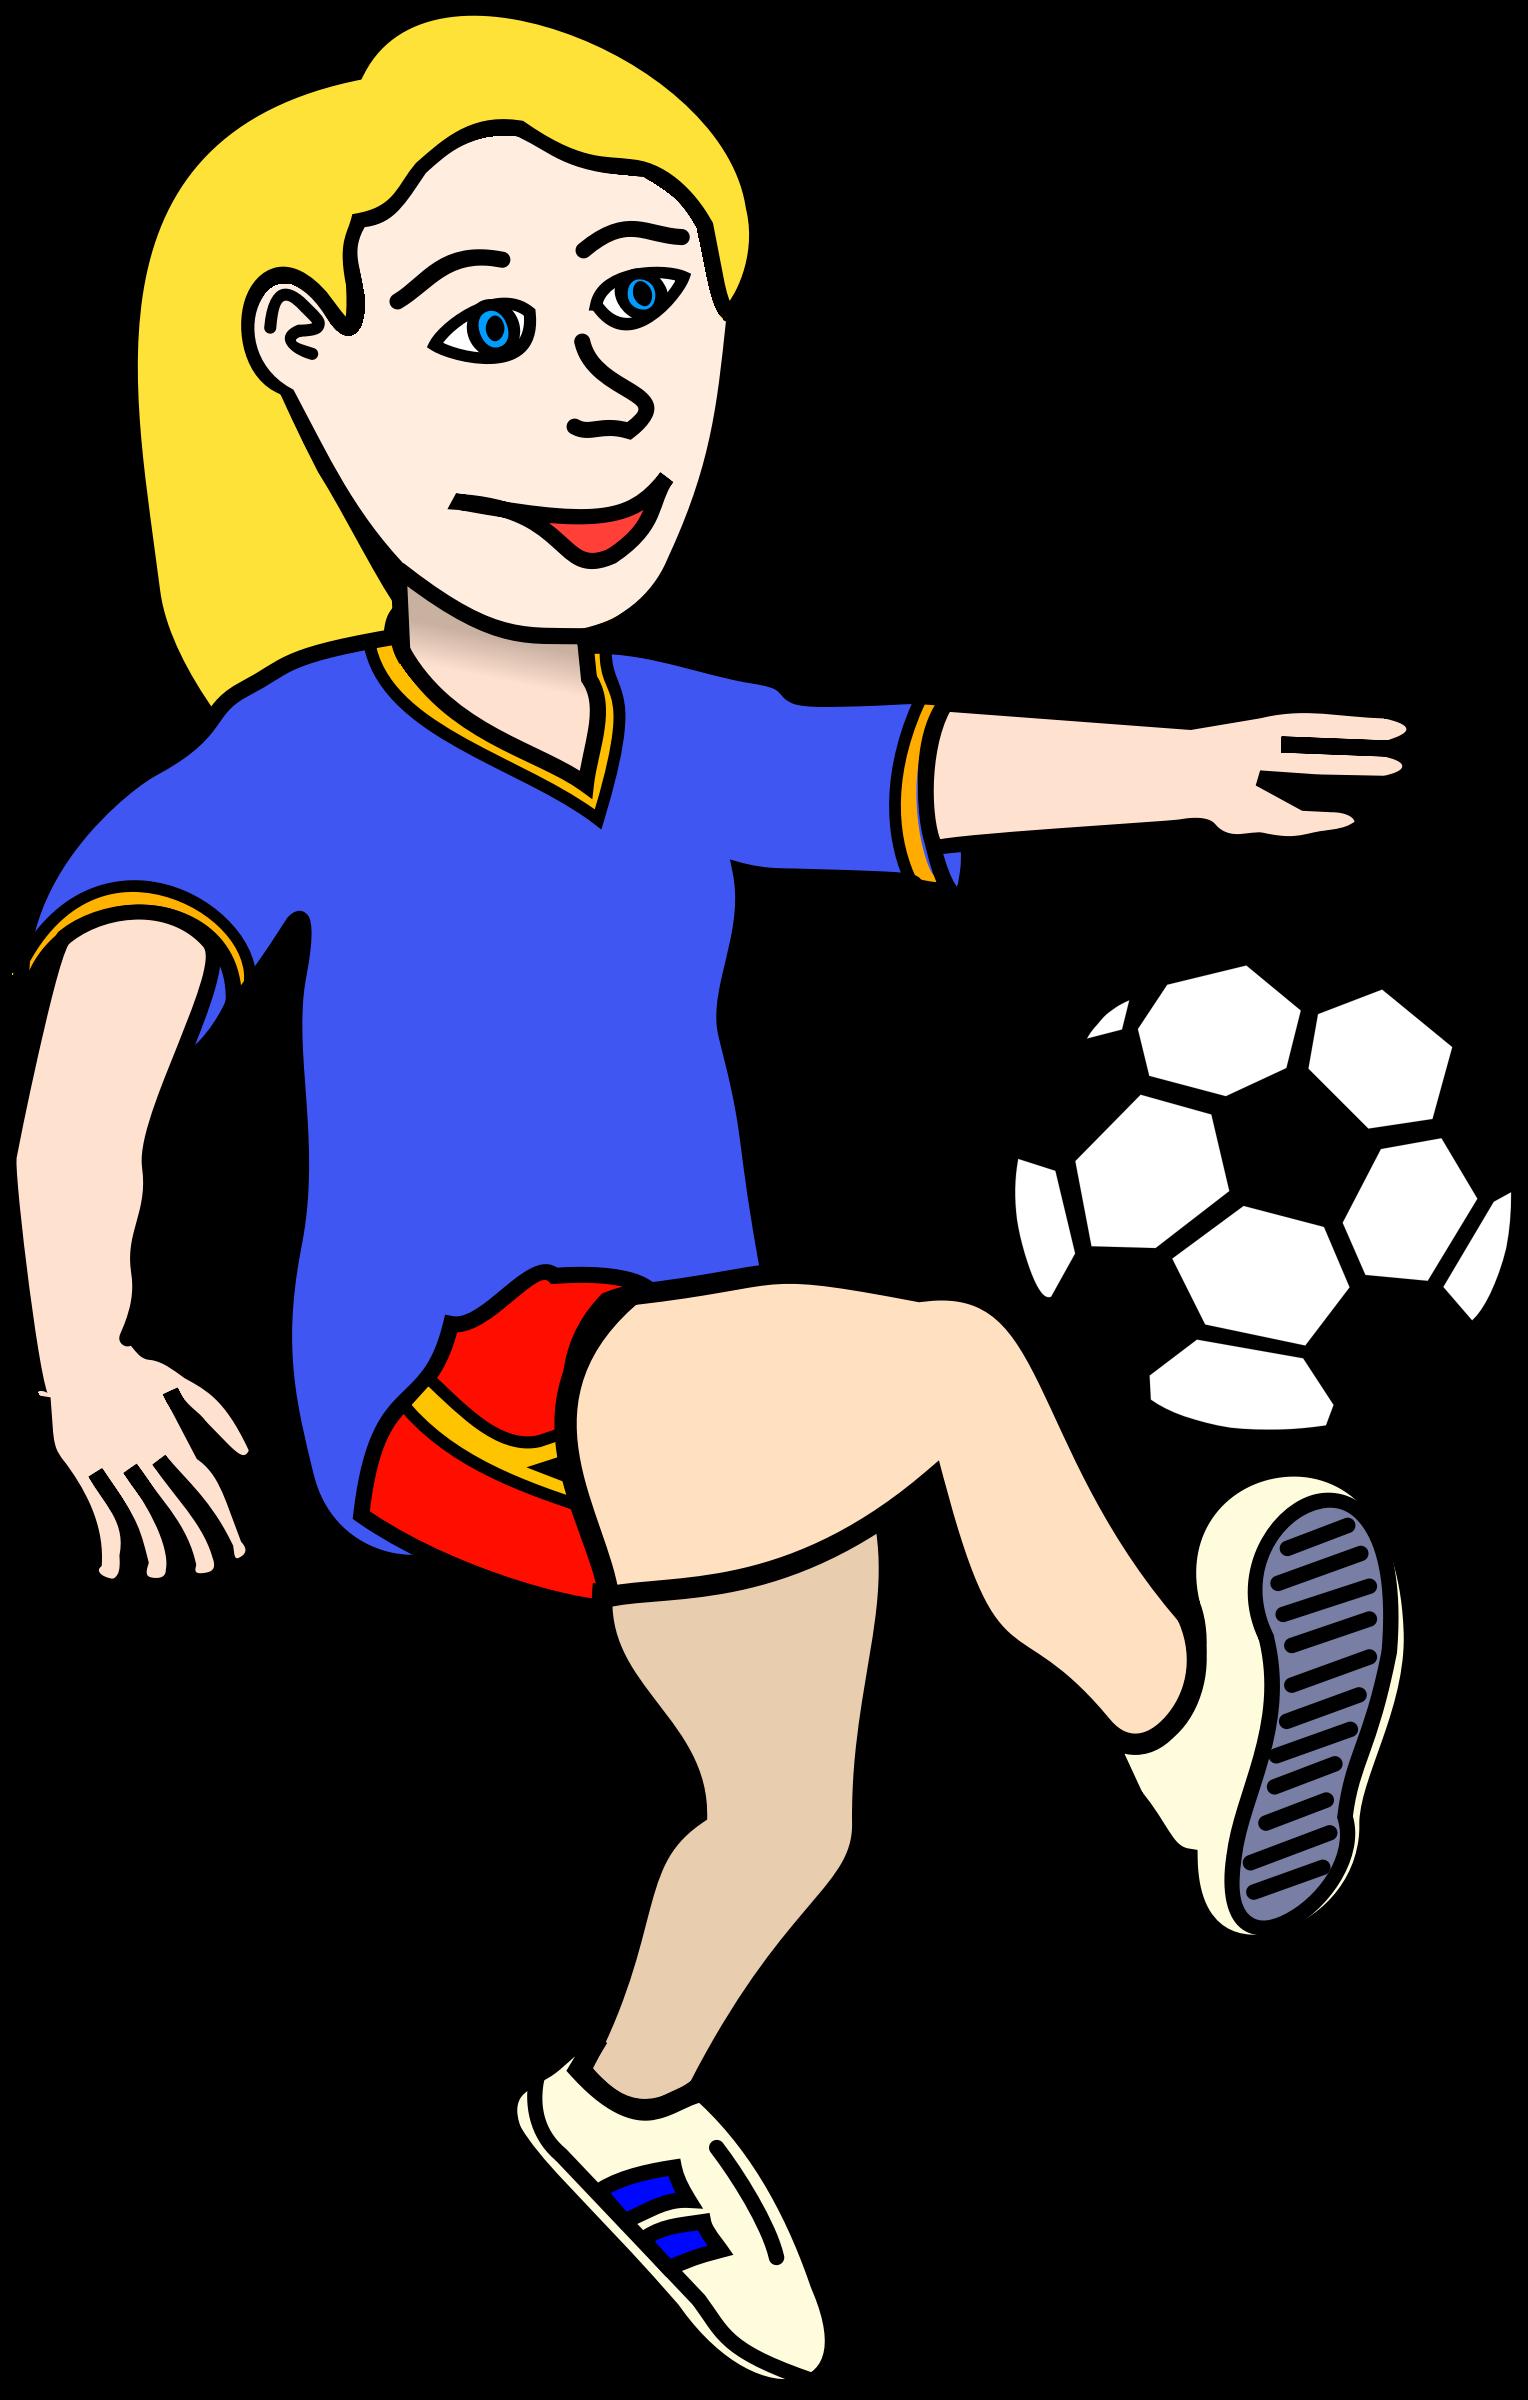 Soccer girl cartoon image. Female clipart sports coach